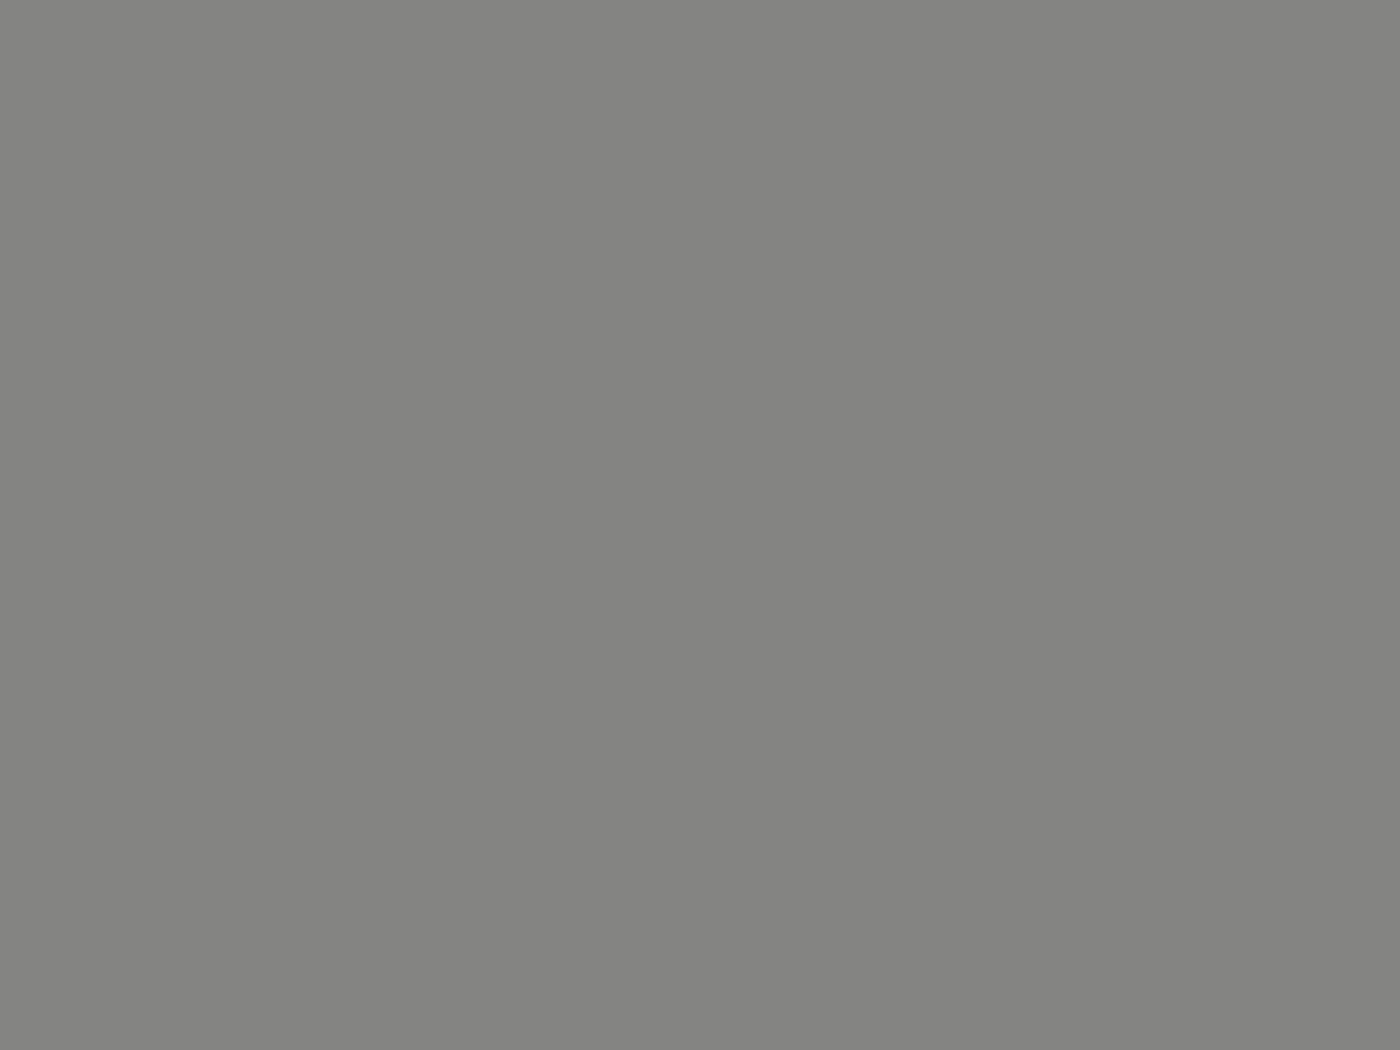 1400x1050 Battleship Grey Solid Color Background